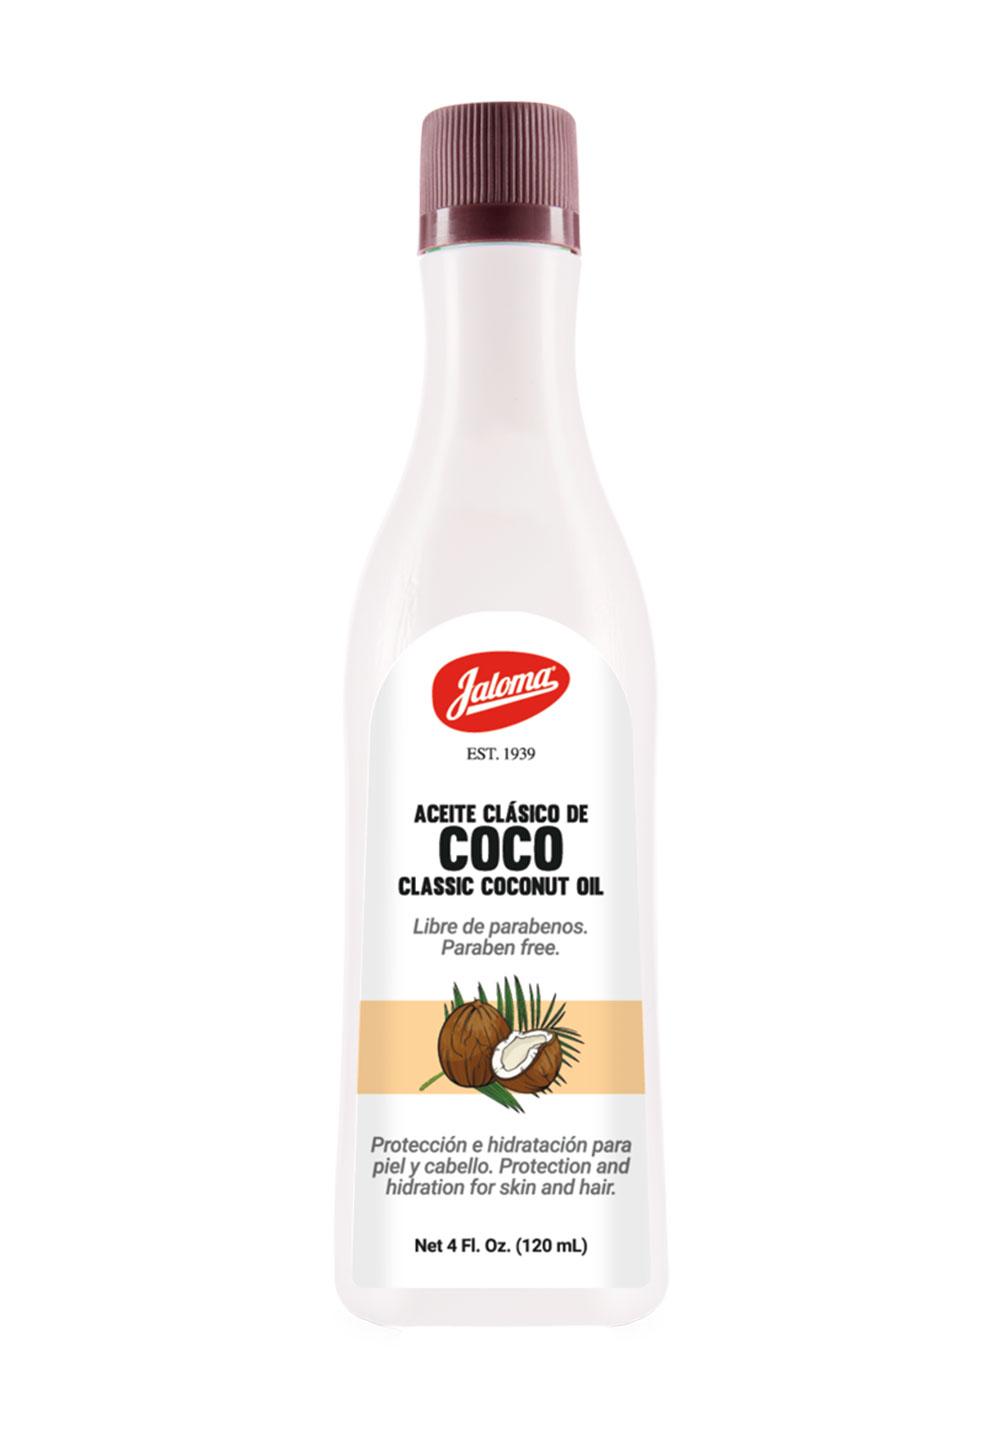 Classic Coconut Oil, Net 4 Fl. Oz.